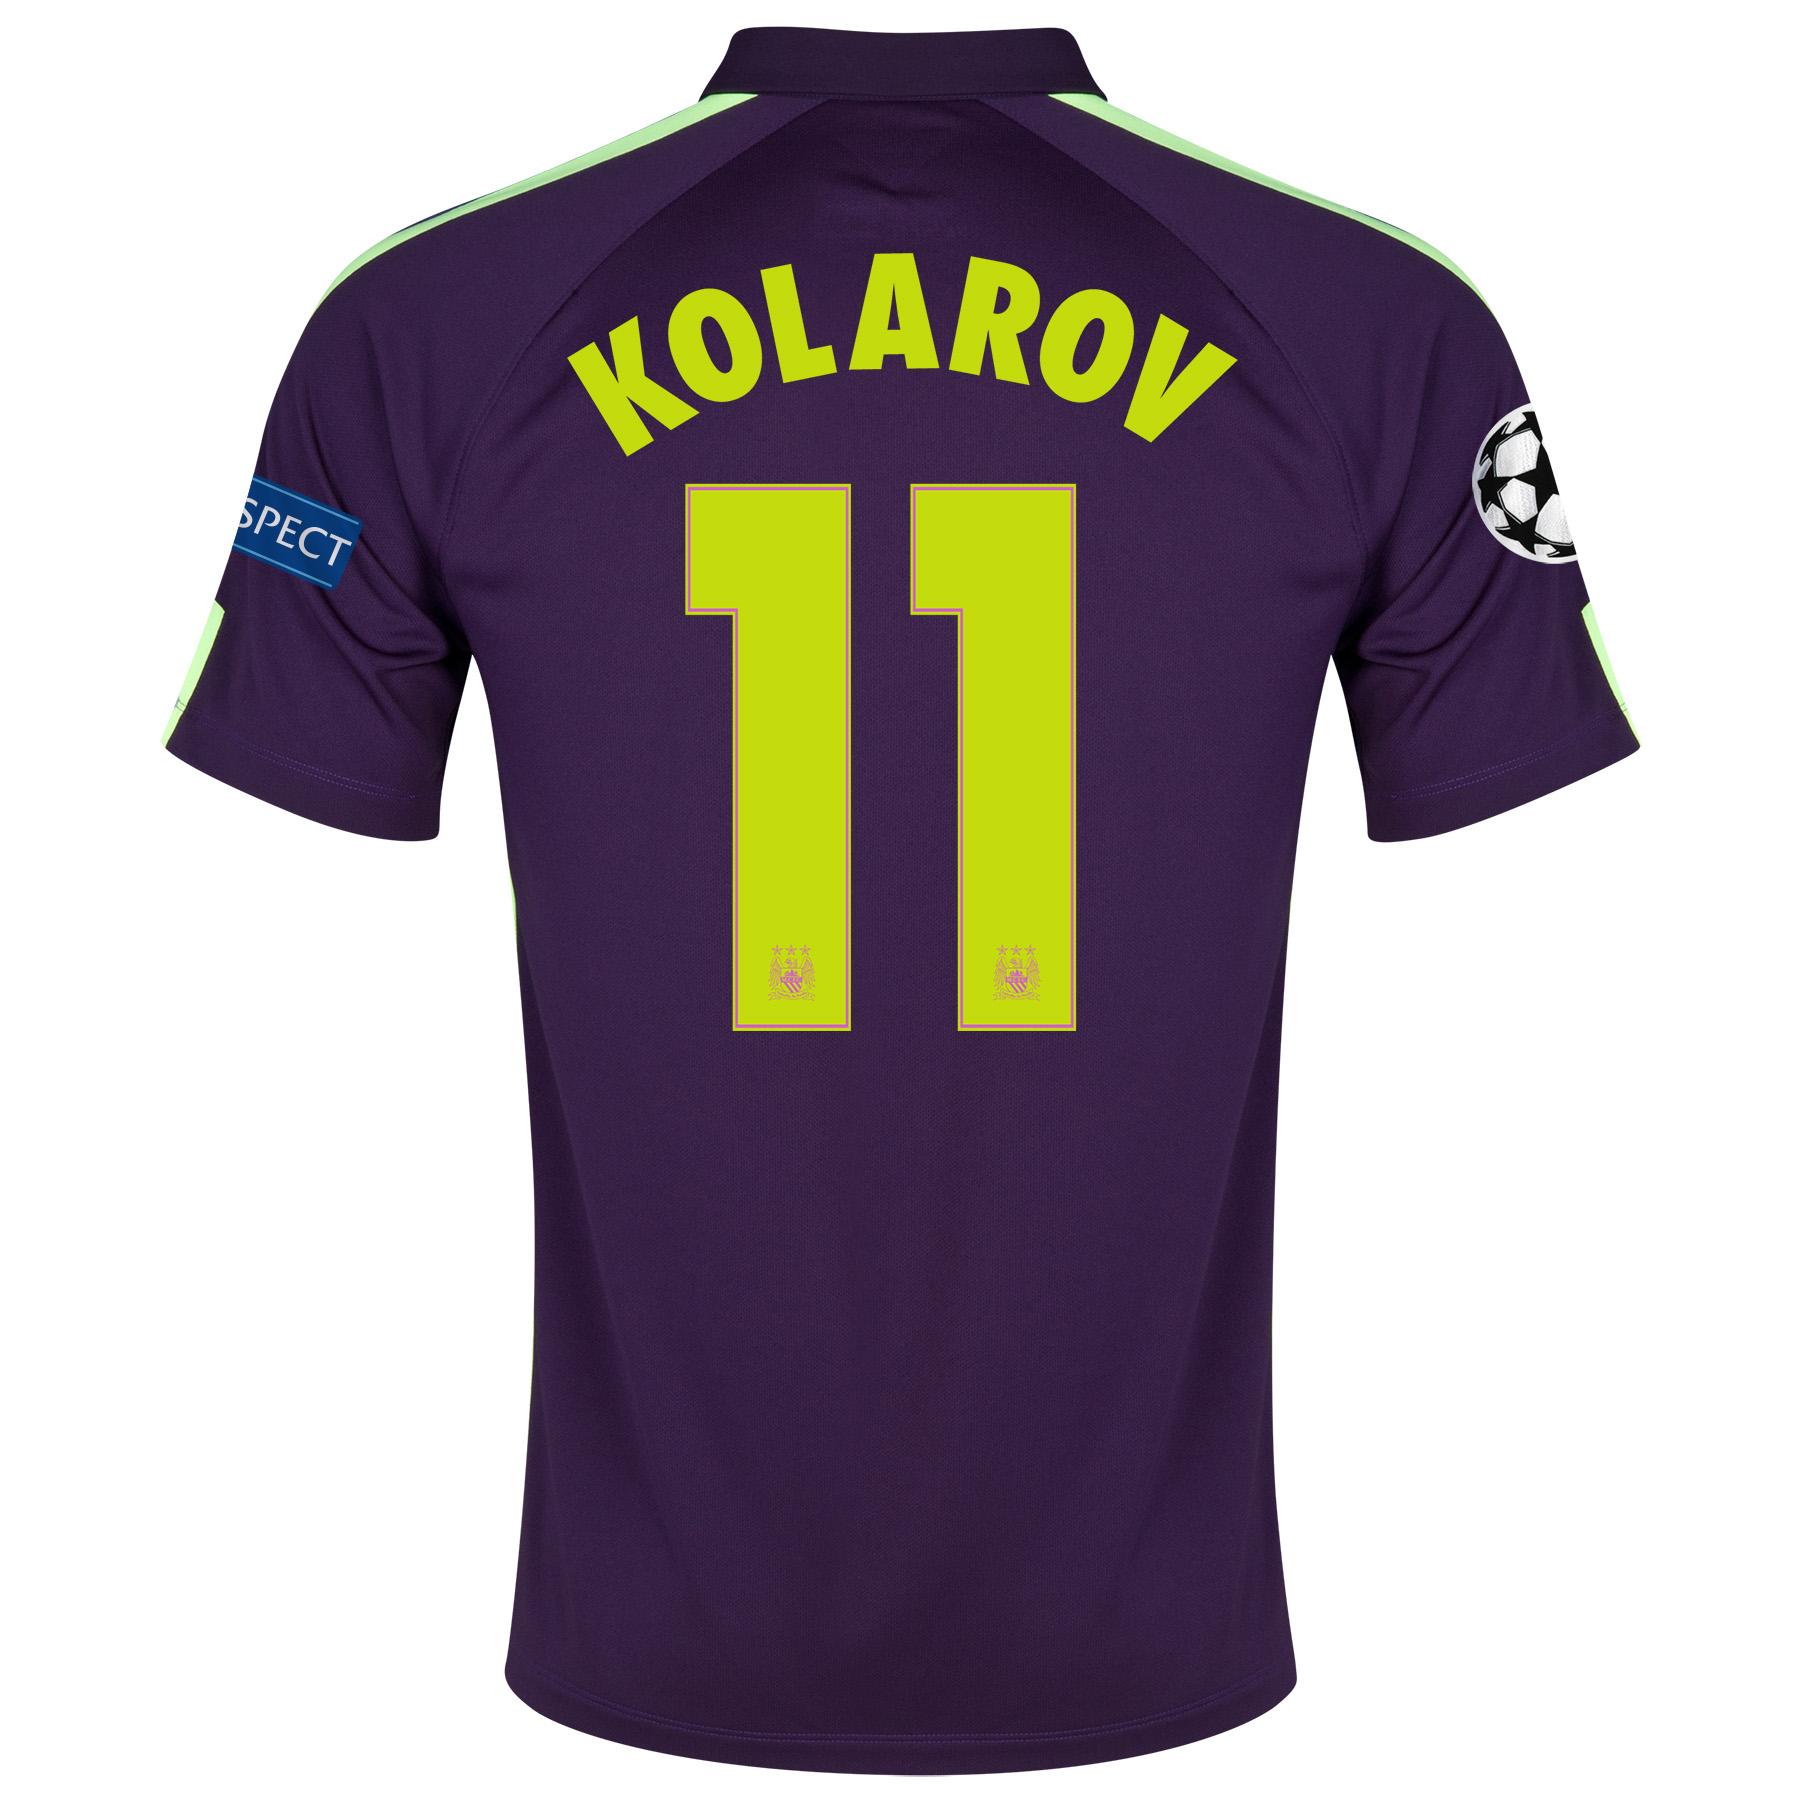 Manchester City UEFA Champions League Cup Away Shirt 2014/15 Purple with Kolarov 11 printing